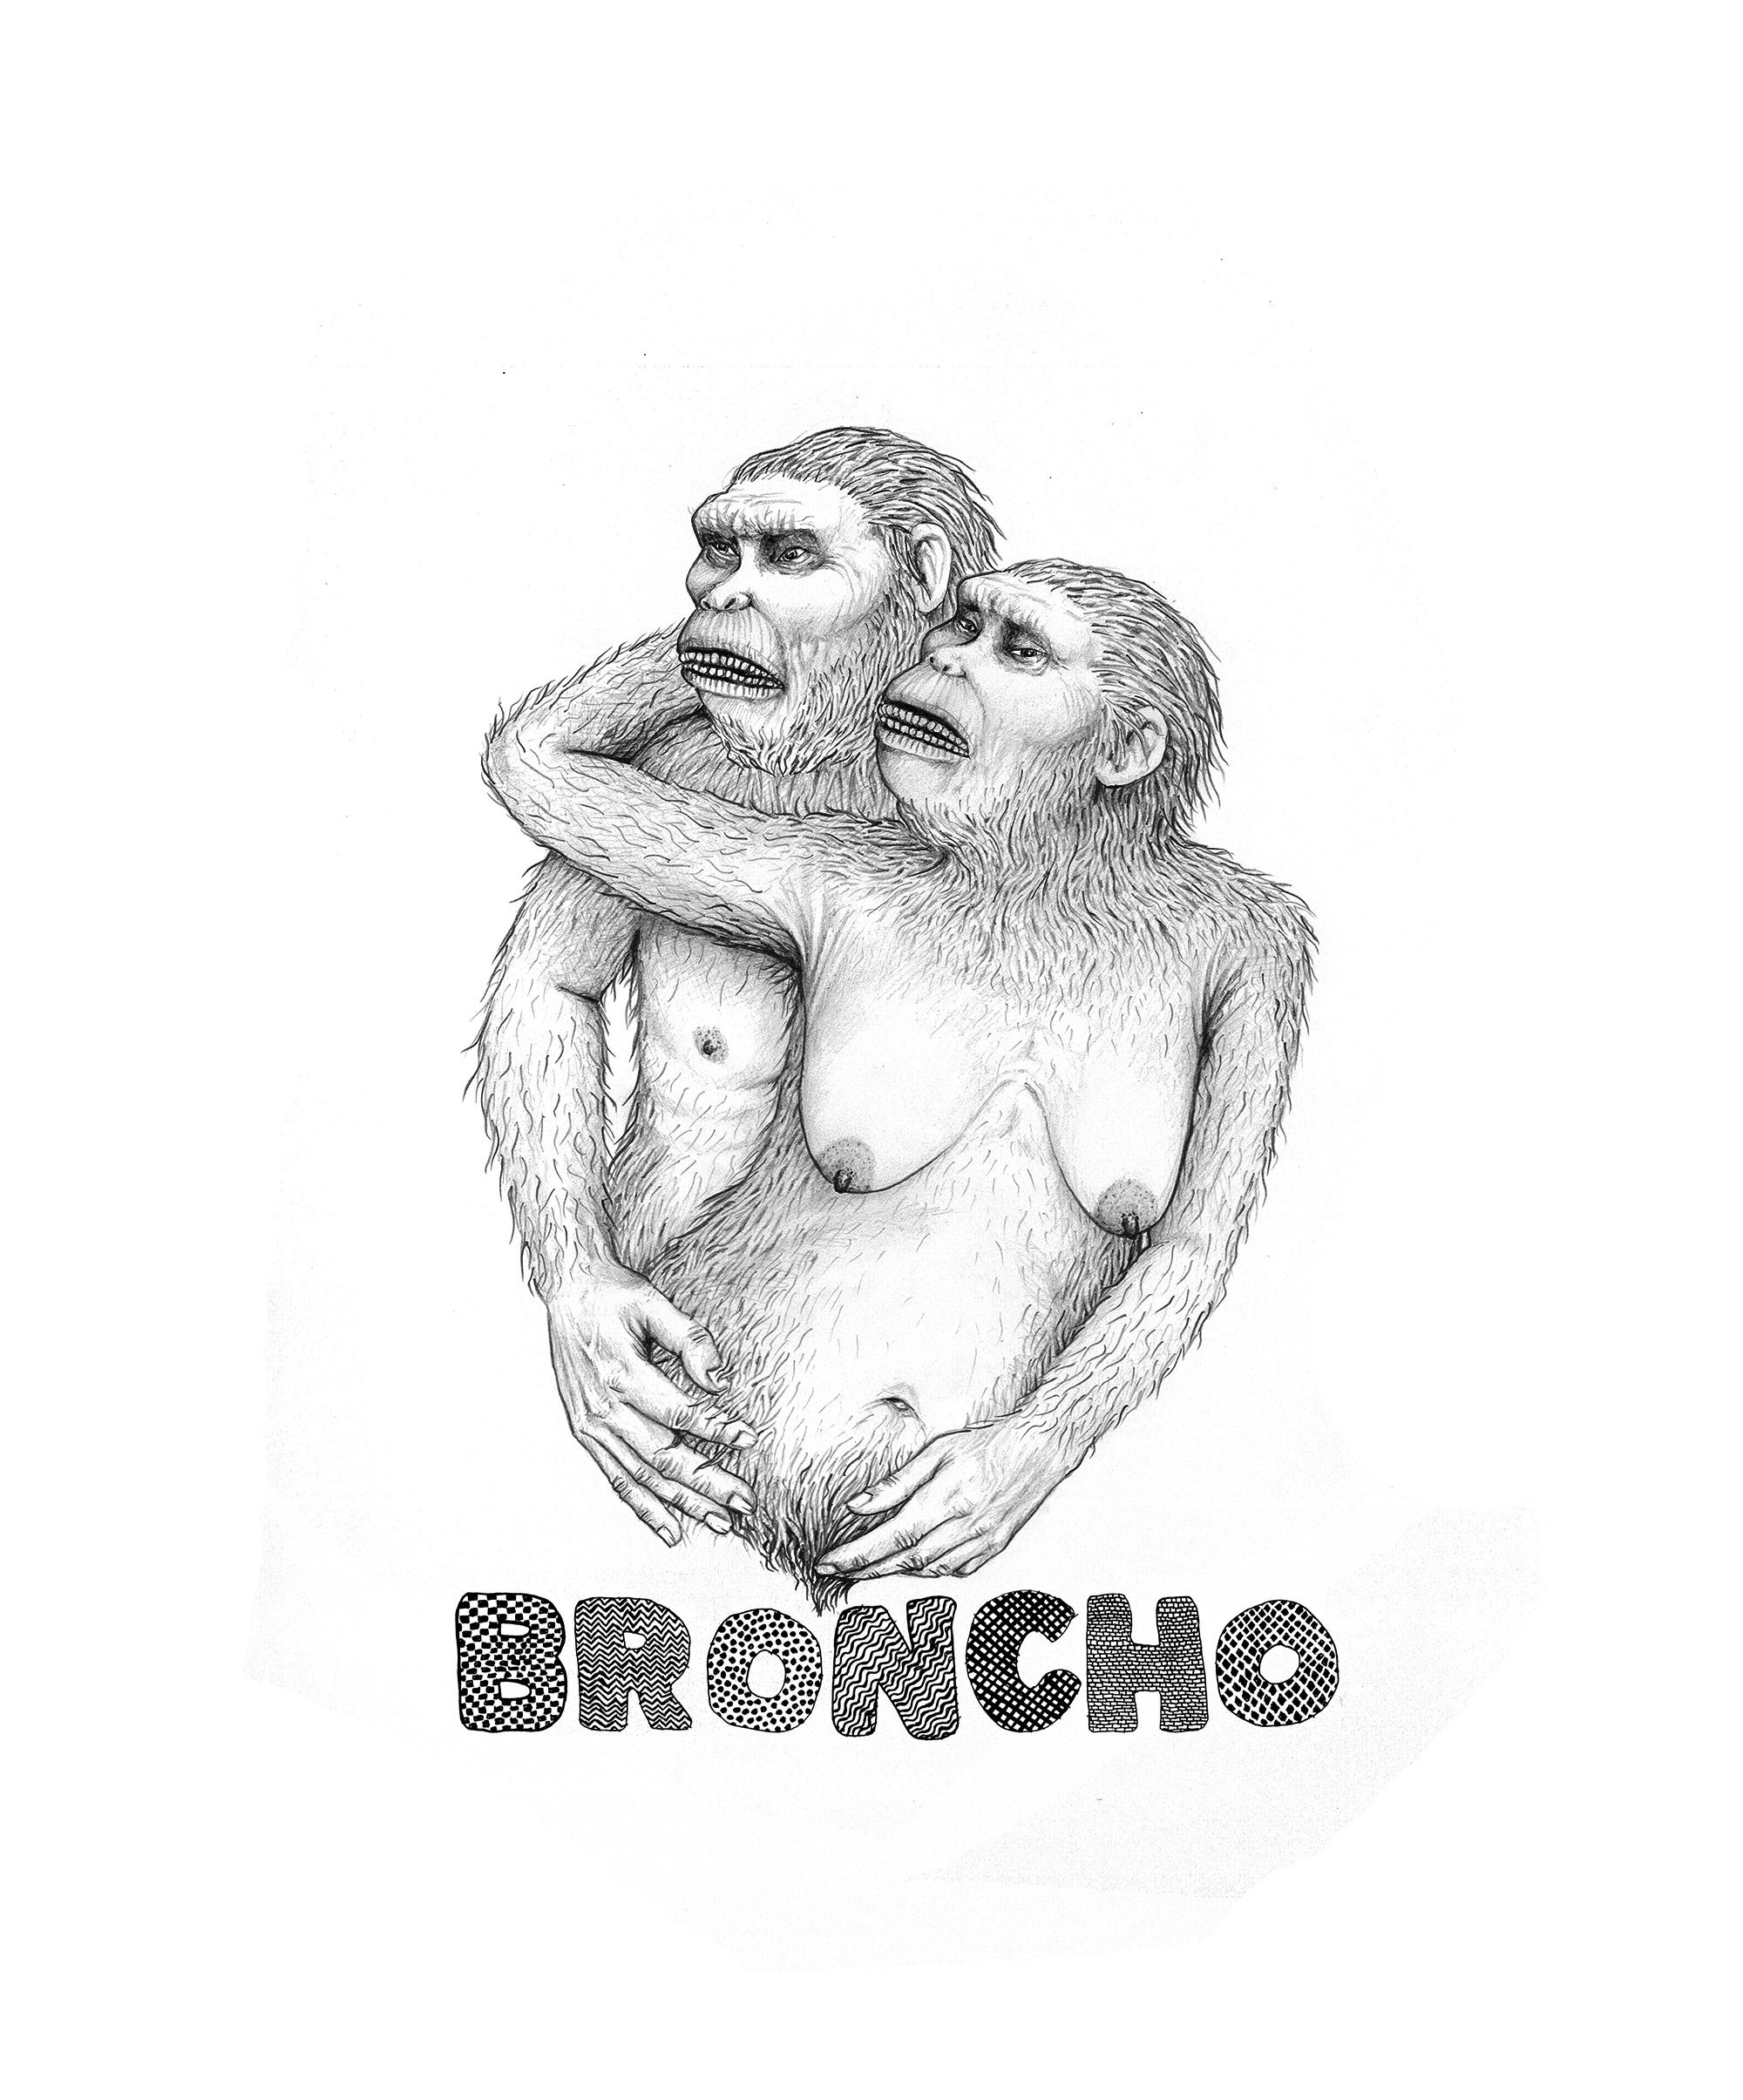 BRONCHO SHIRT v3 (small).jpg